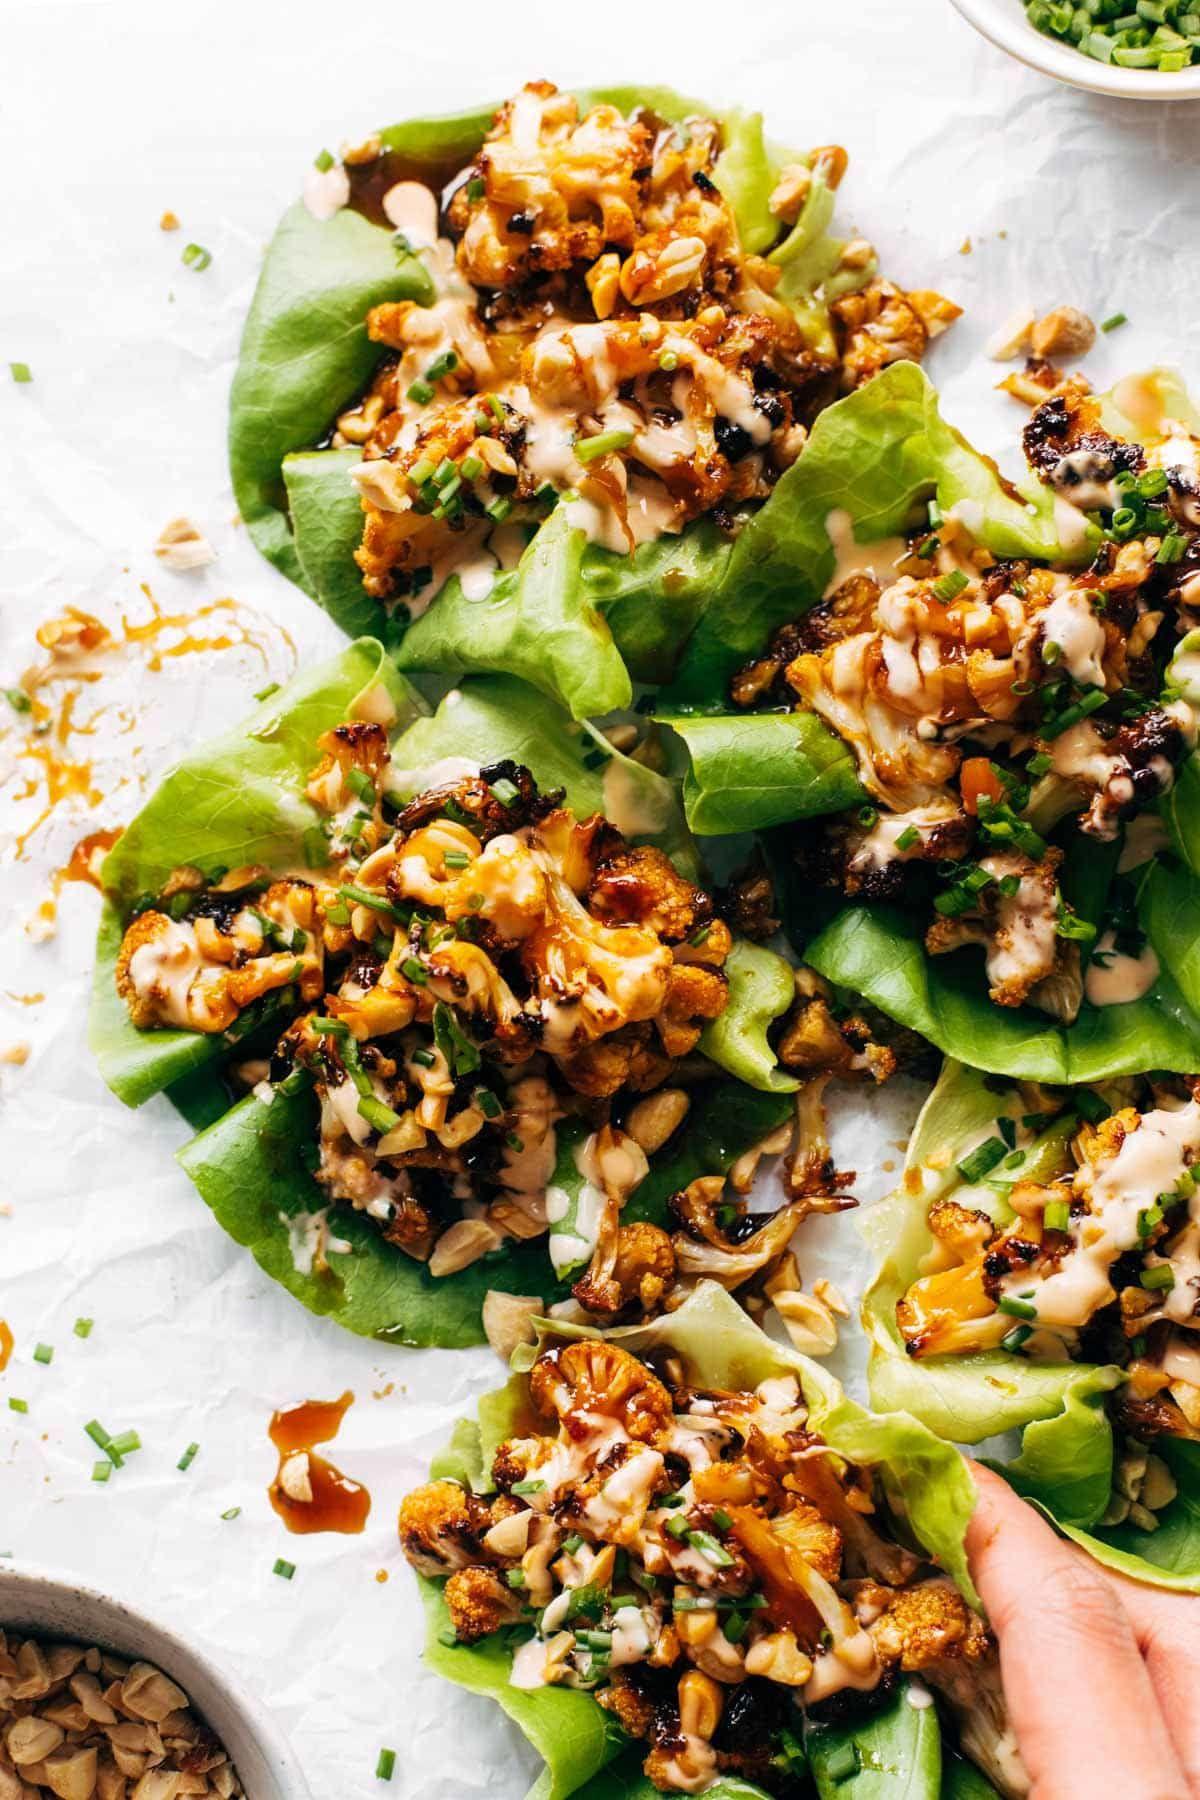 Korean Bbq Style Cauliflower Lettuce Wraps Pinch Of Yum Recipe Healthy Recipes Vegetarian Recipes Food